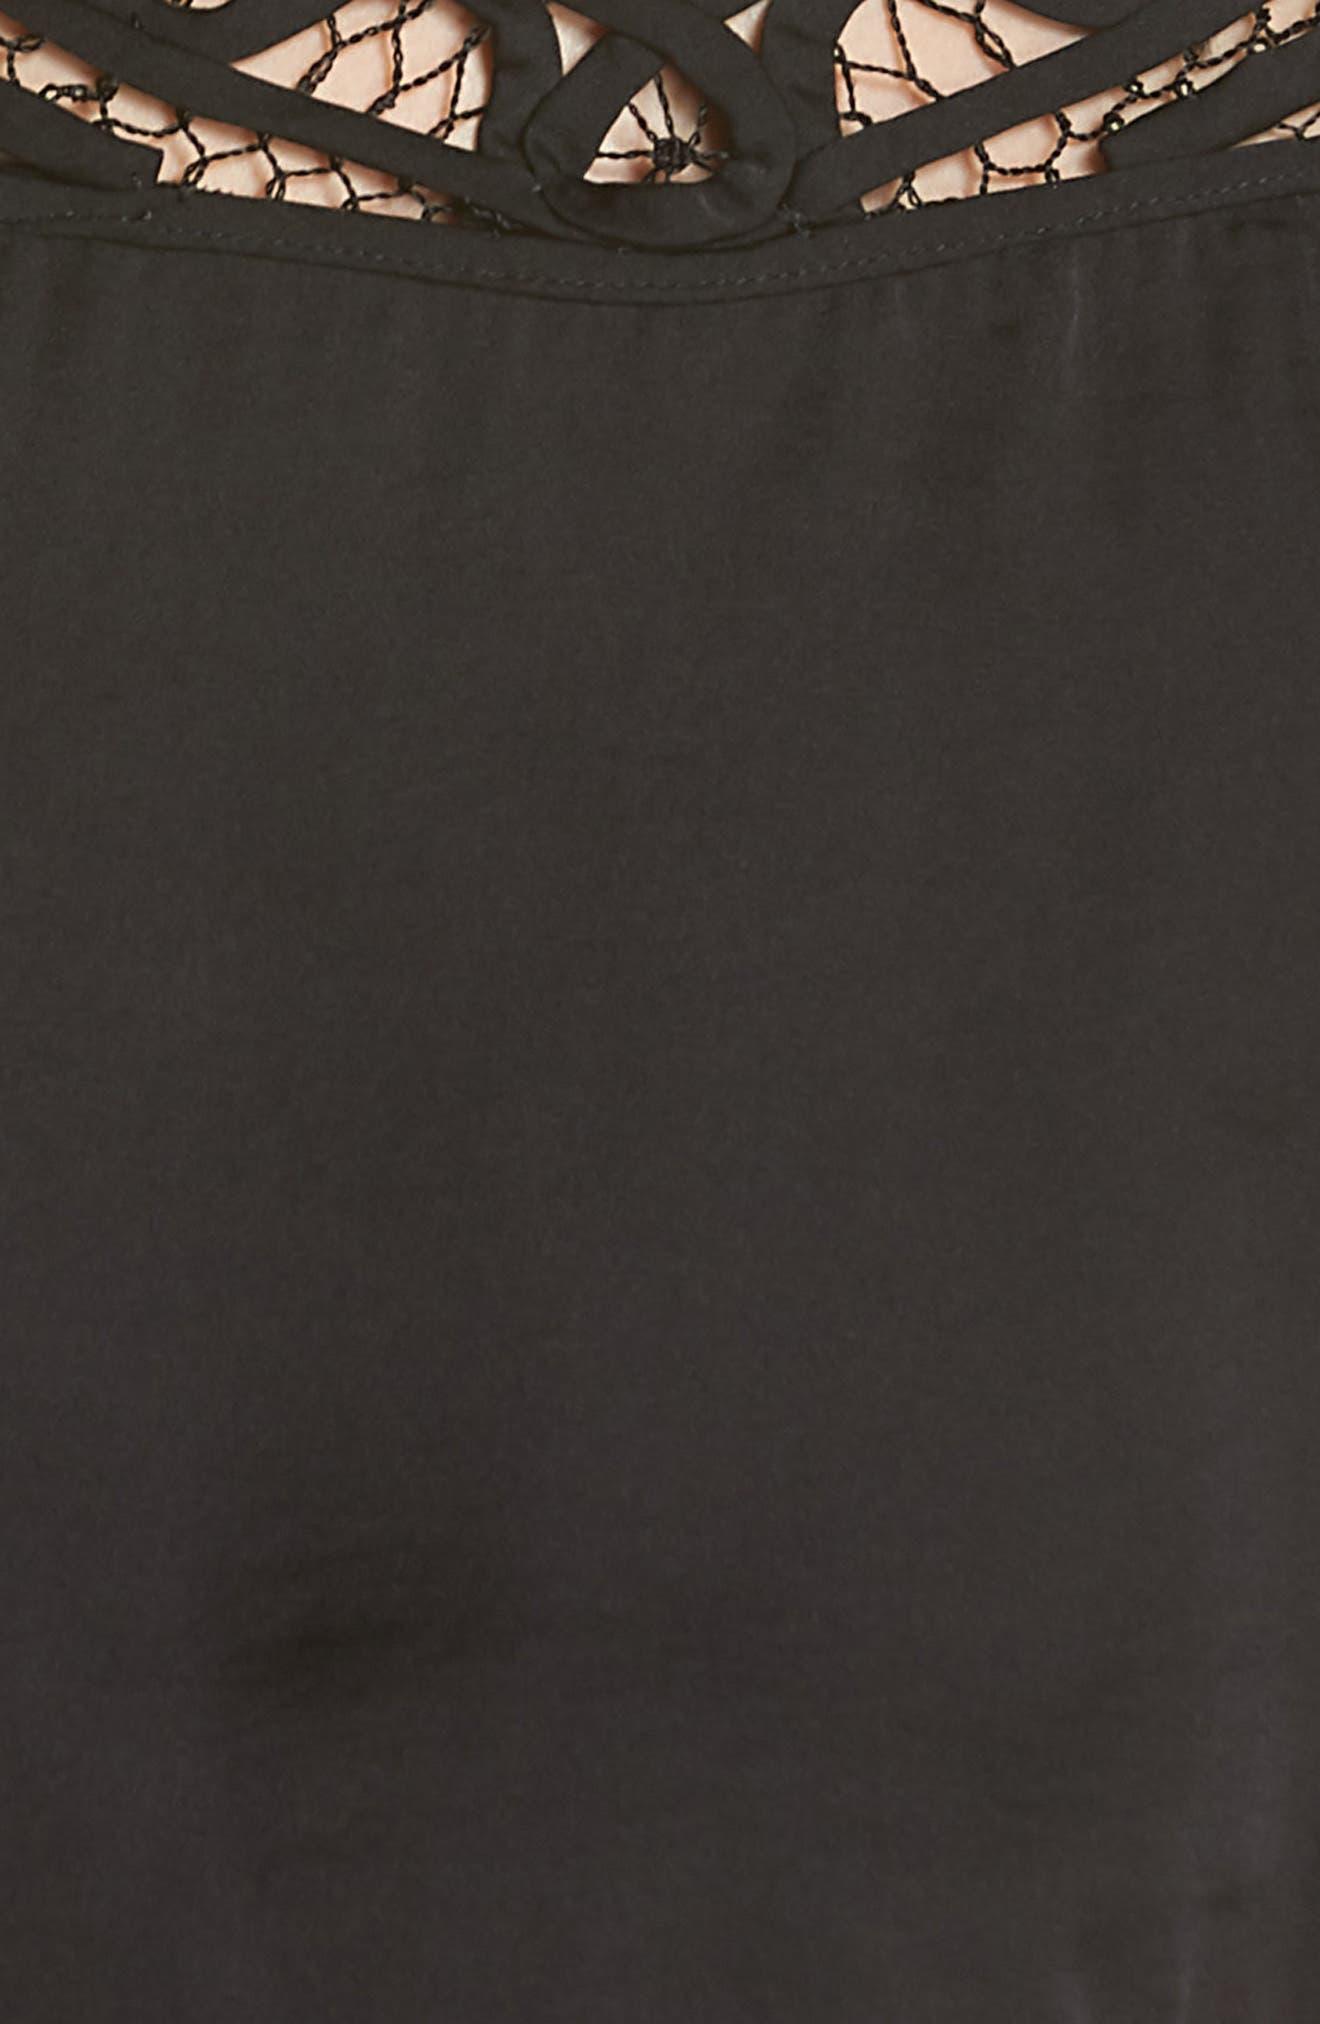 Intimately FP Blouson Crop Top,                             Alternate thumbnail 5, color,                             BLACK